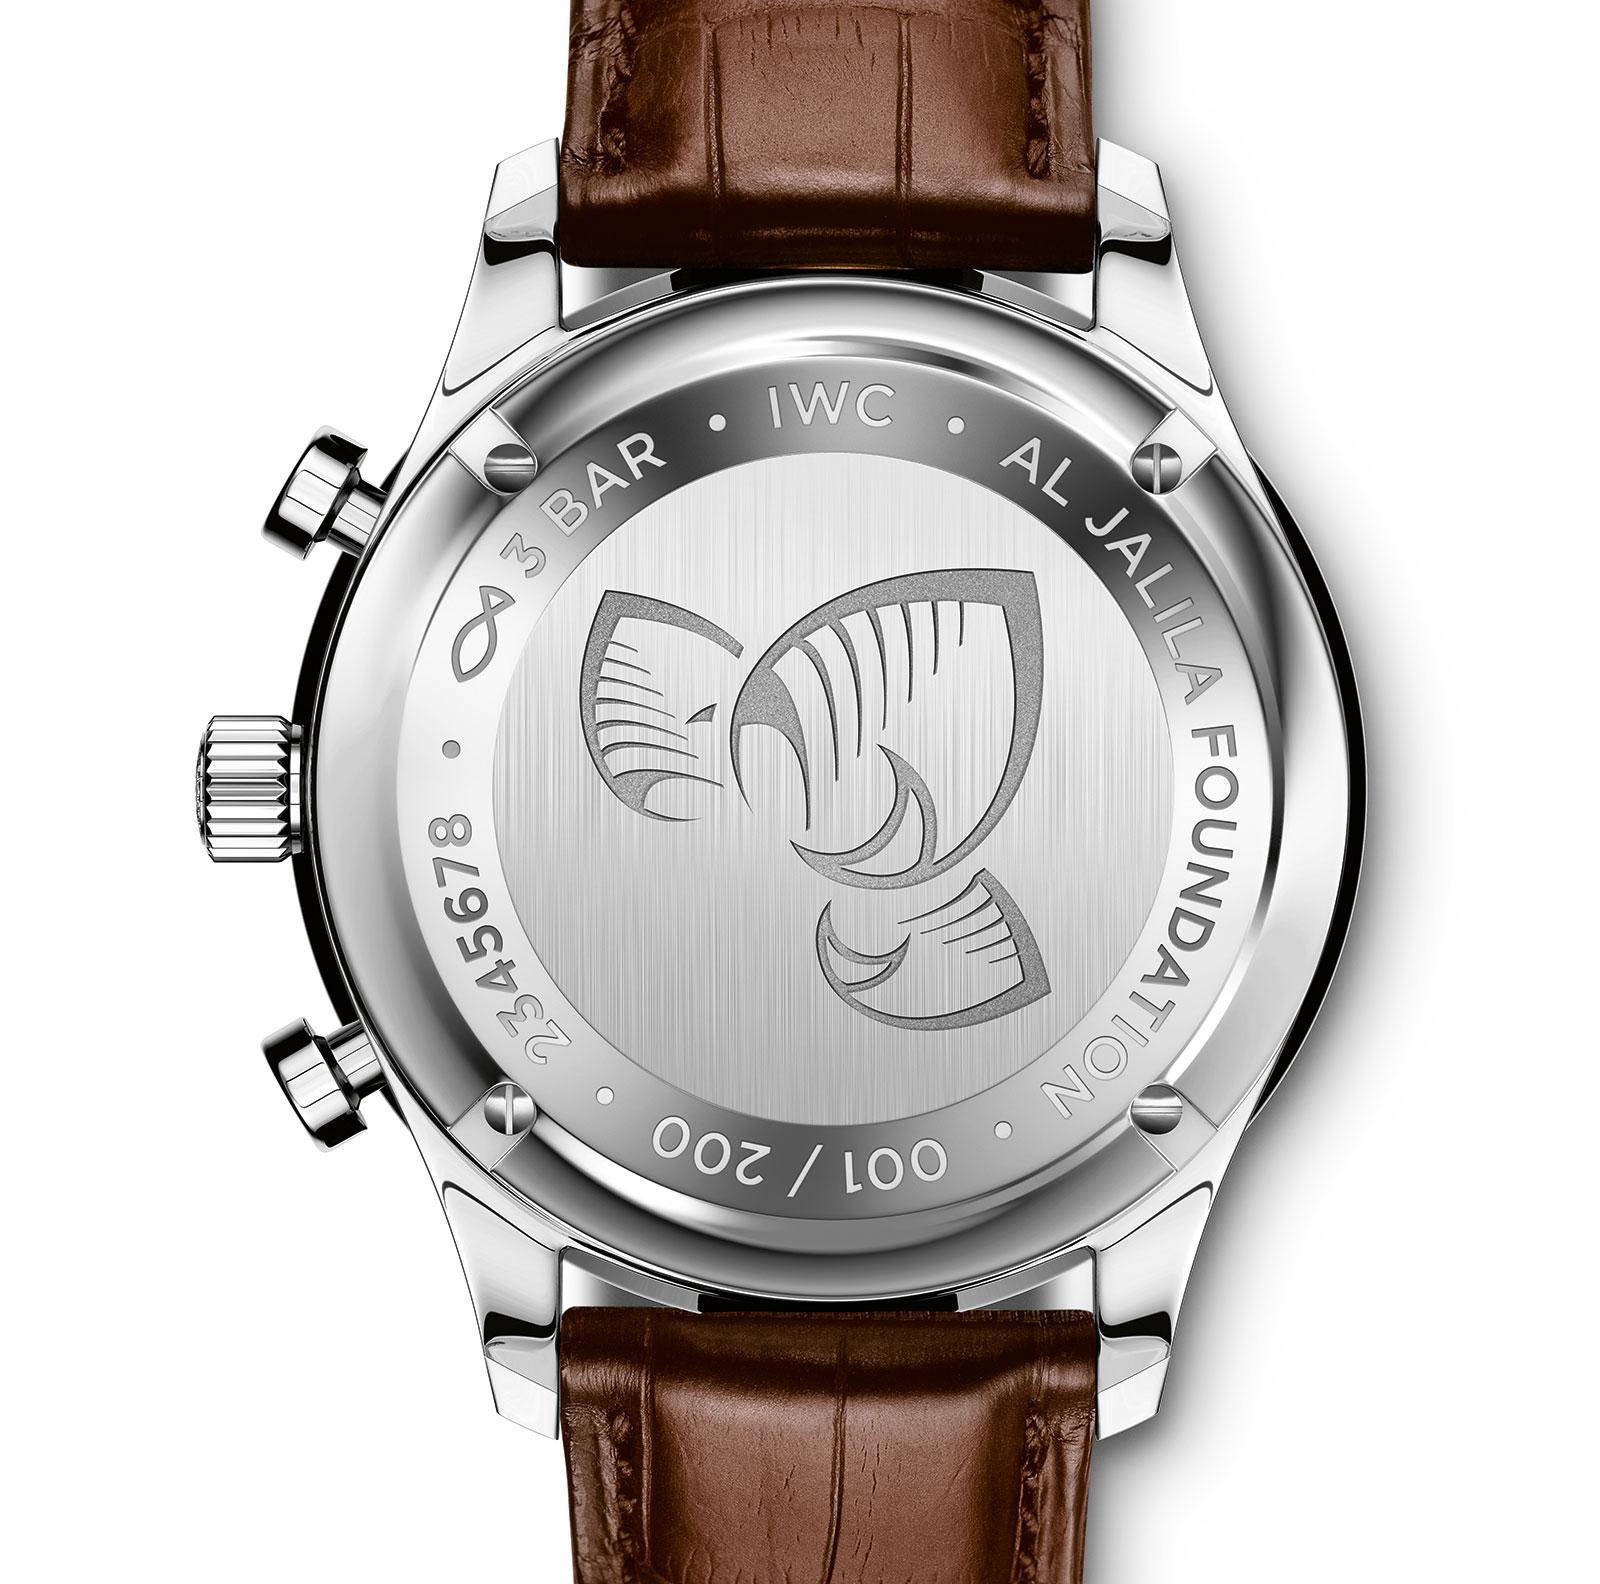 IWC Portugieser Chronograph Seddiqi Dubai 1